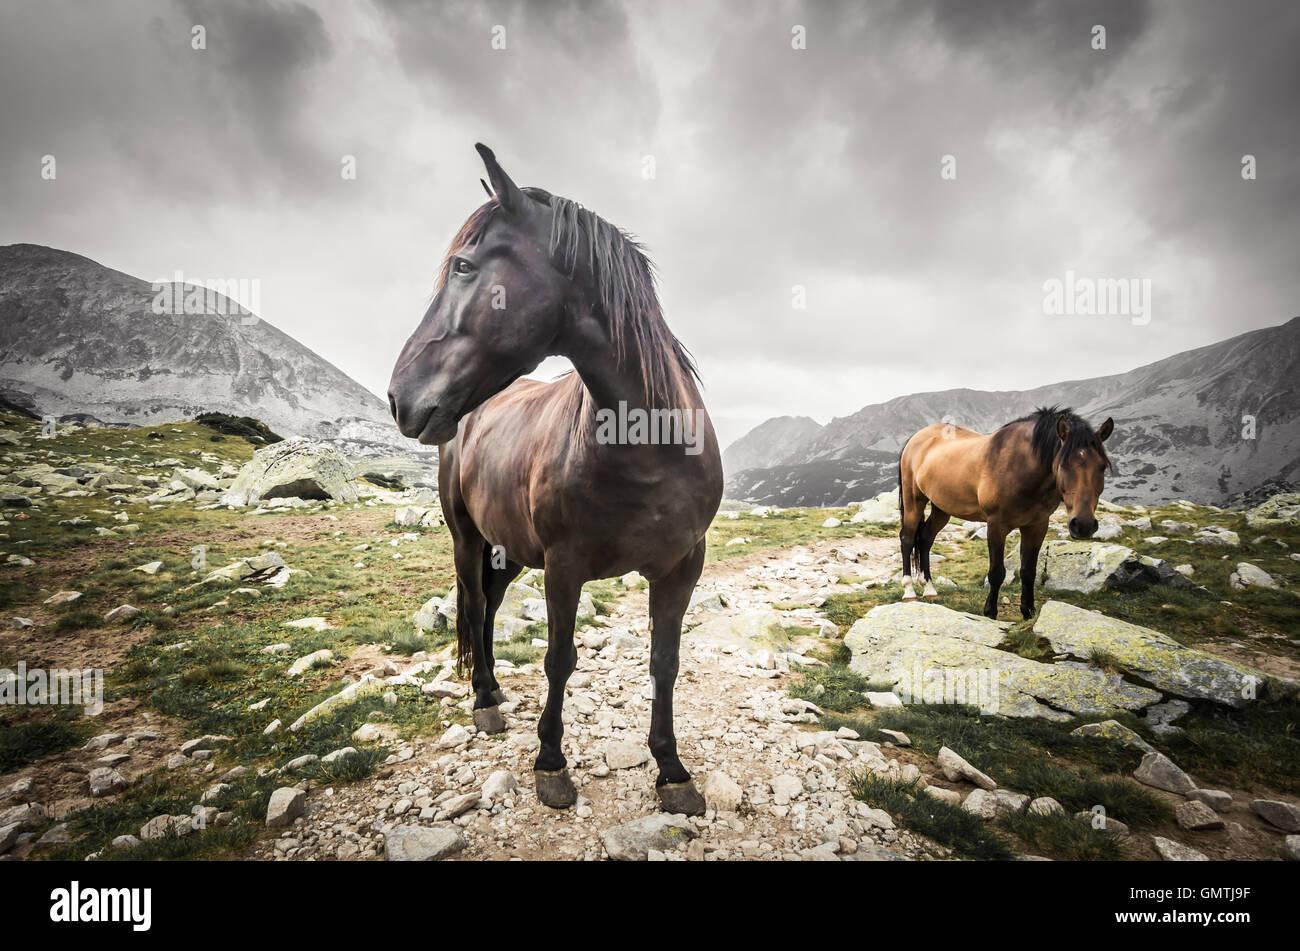 Wild horses in mountains. Horse in Retezat mountain, Romania. - Stock Image